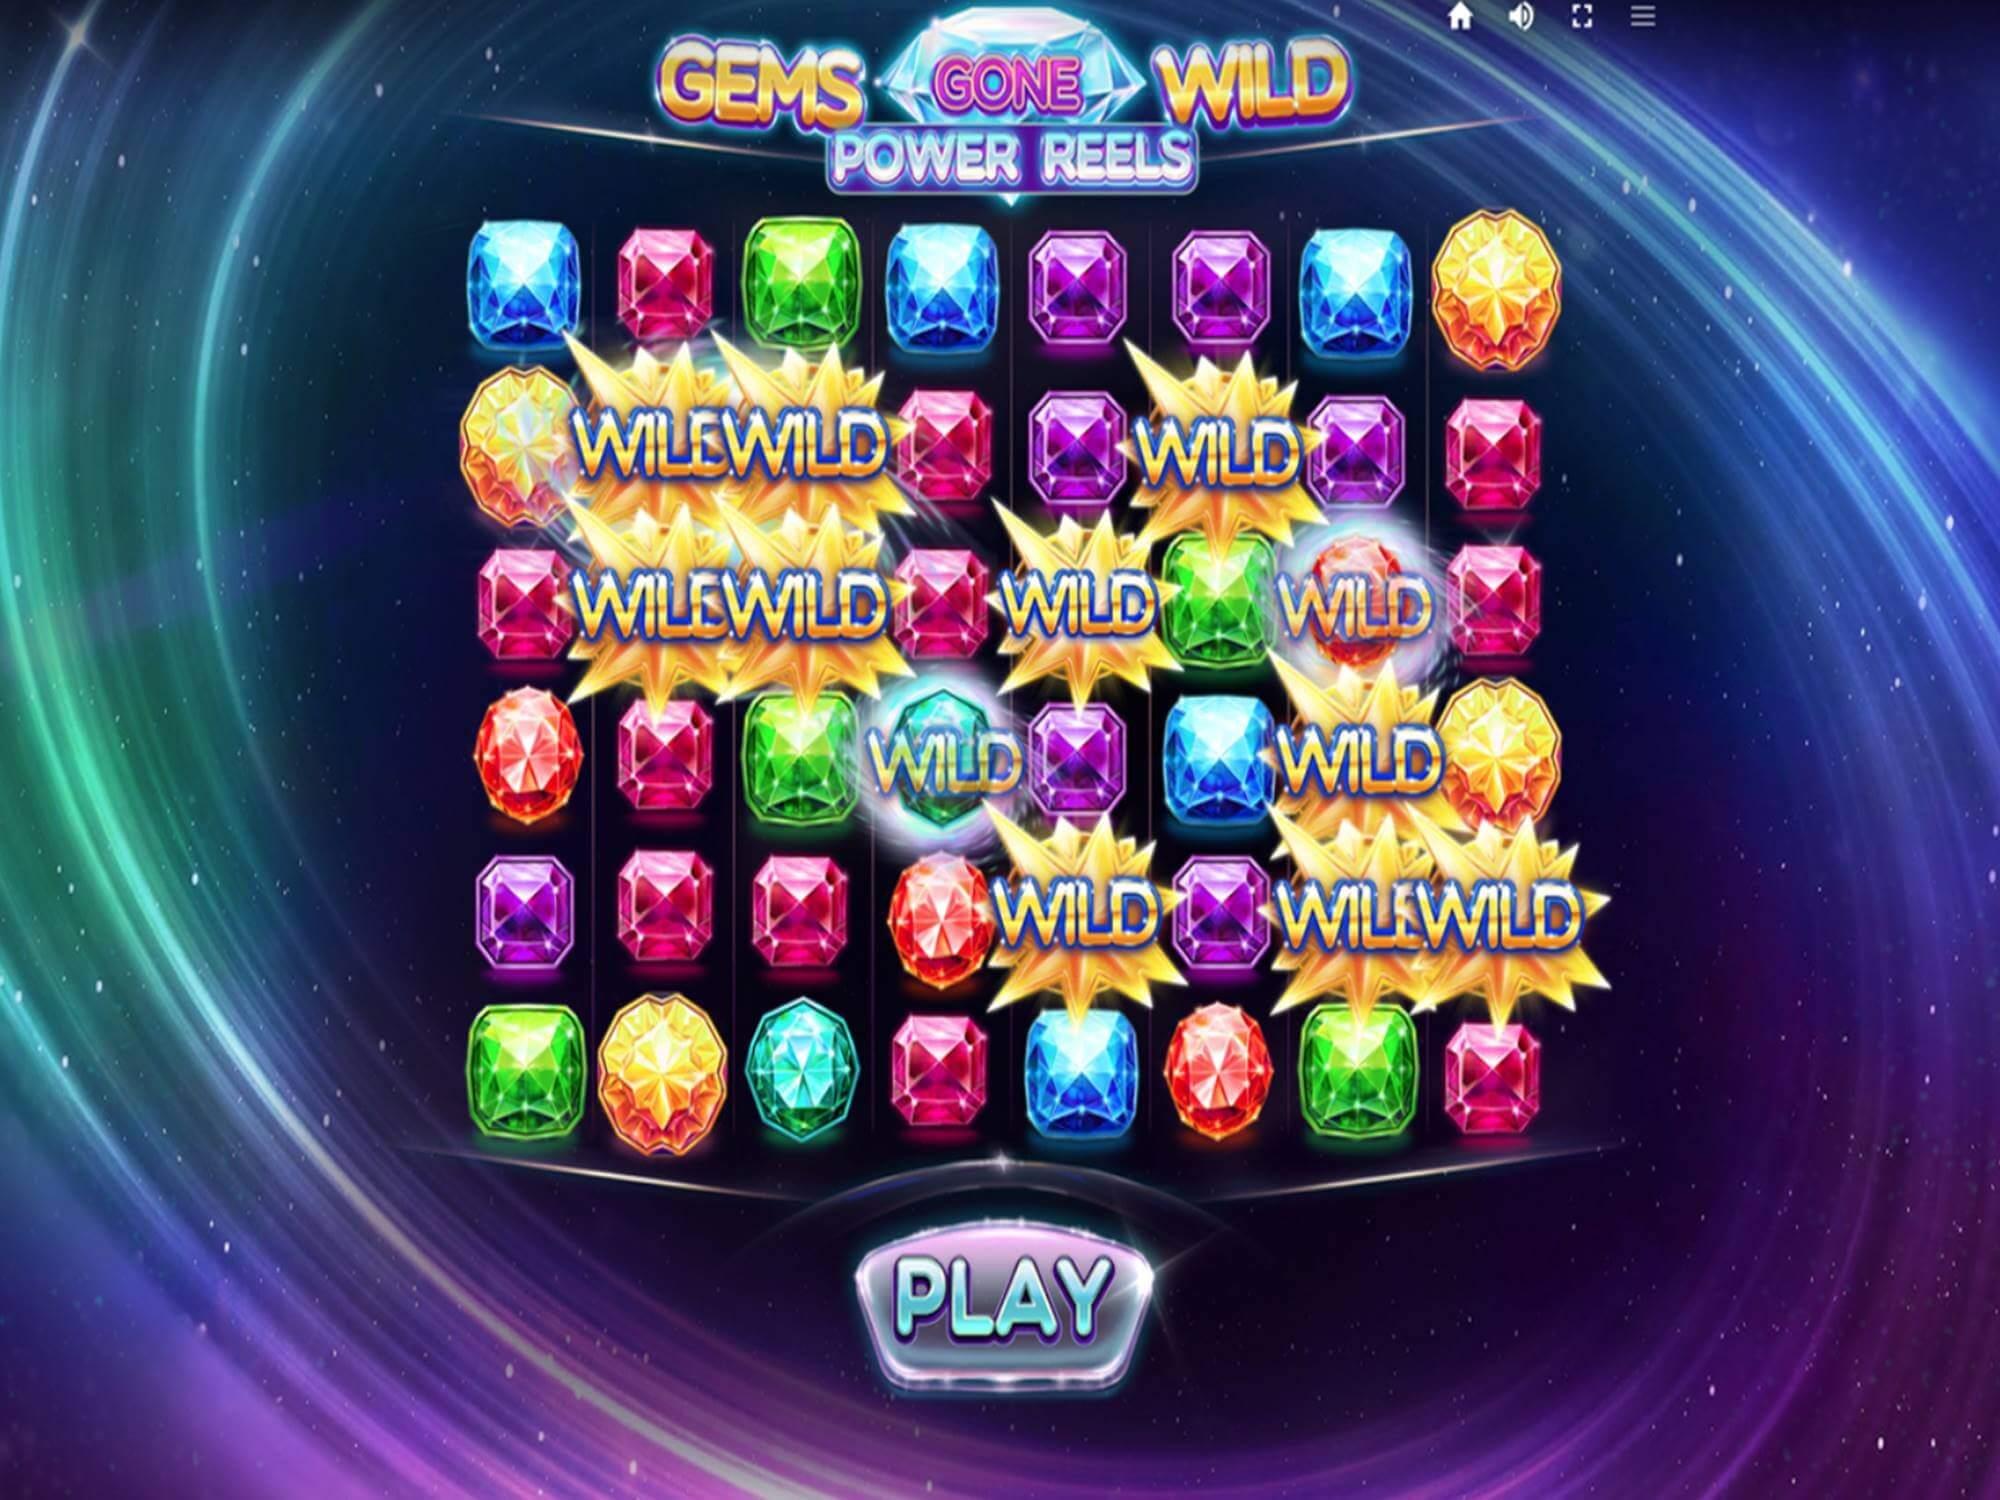 Gems Gone Wild Power Reels Slot Gameplay